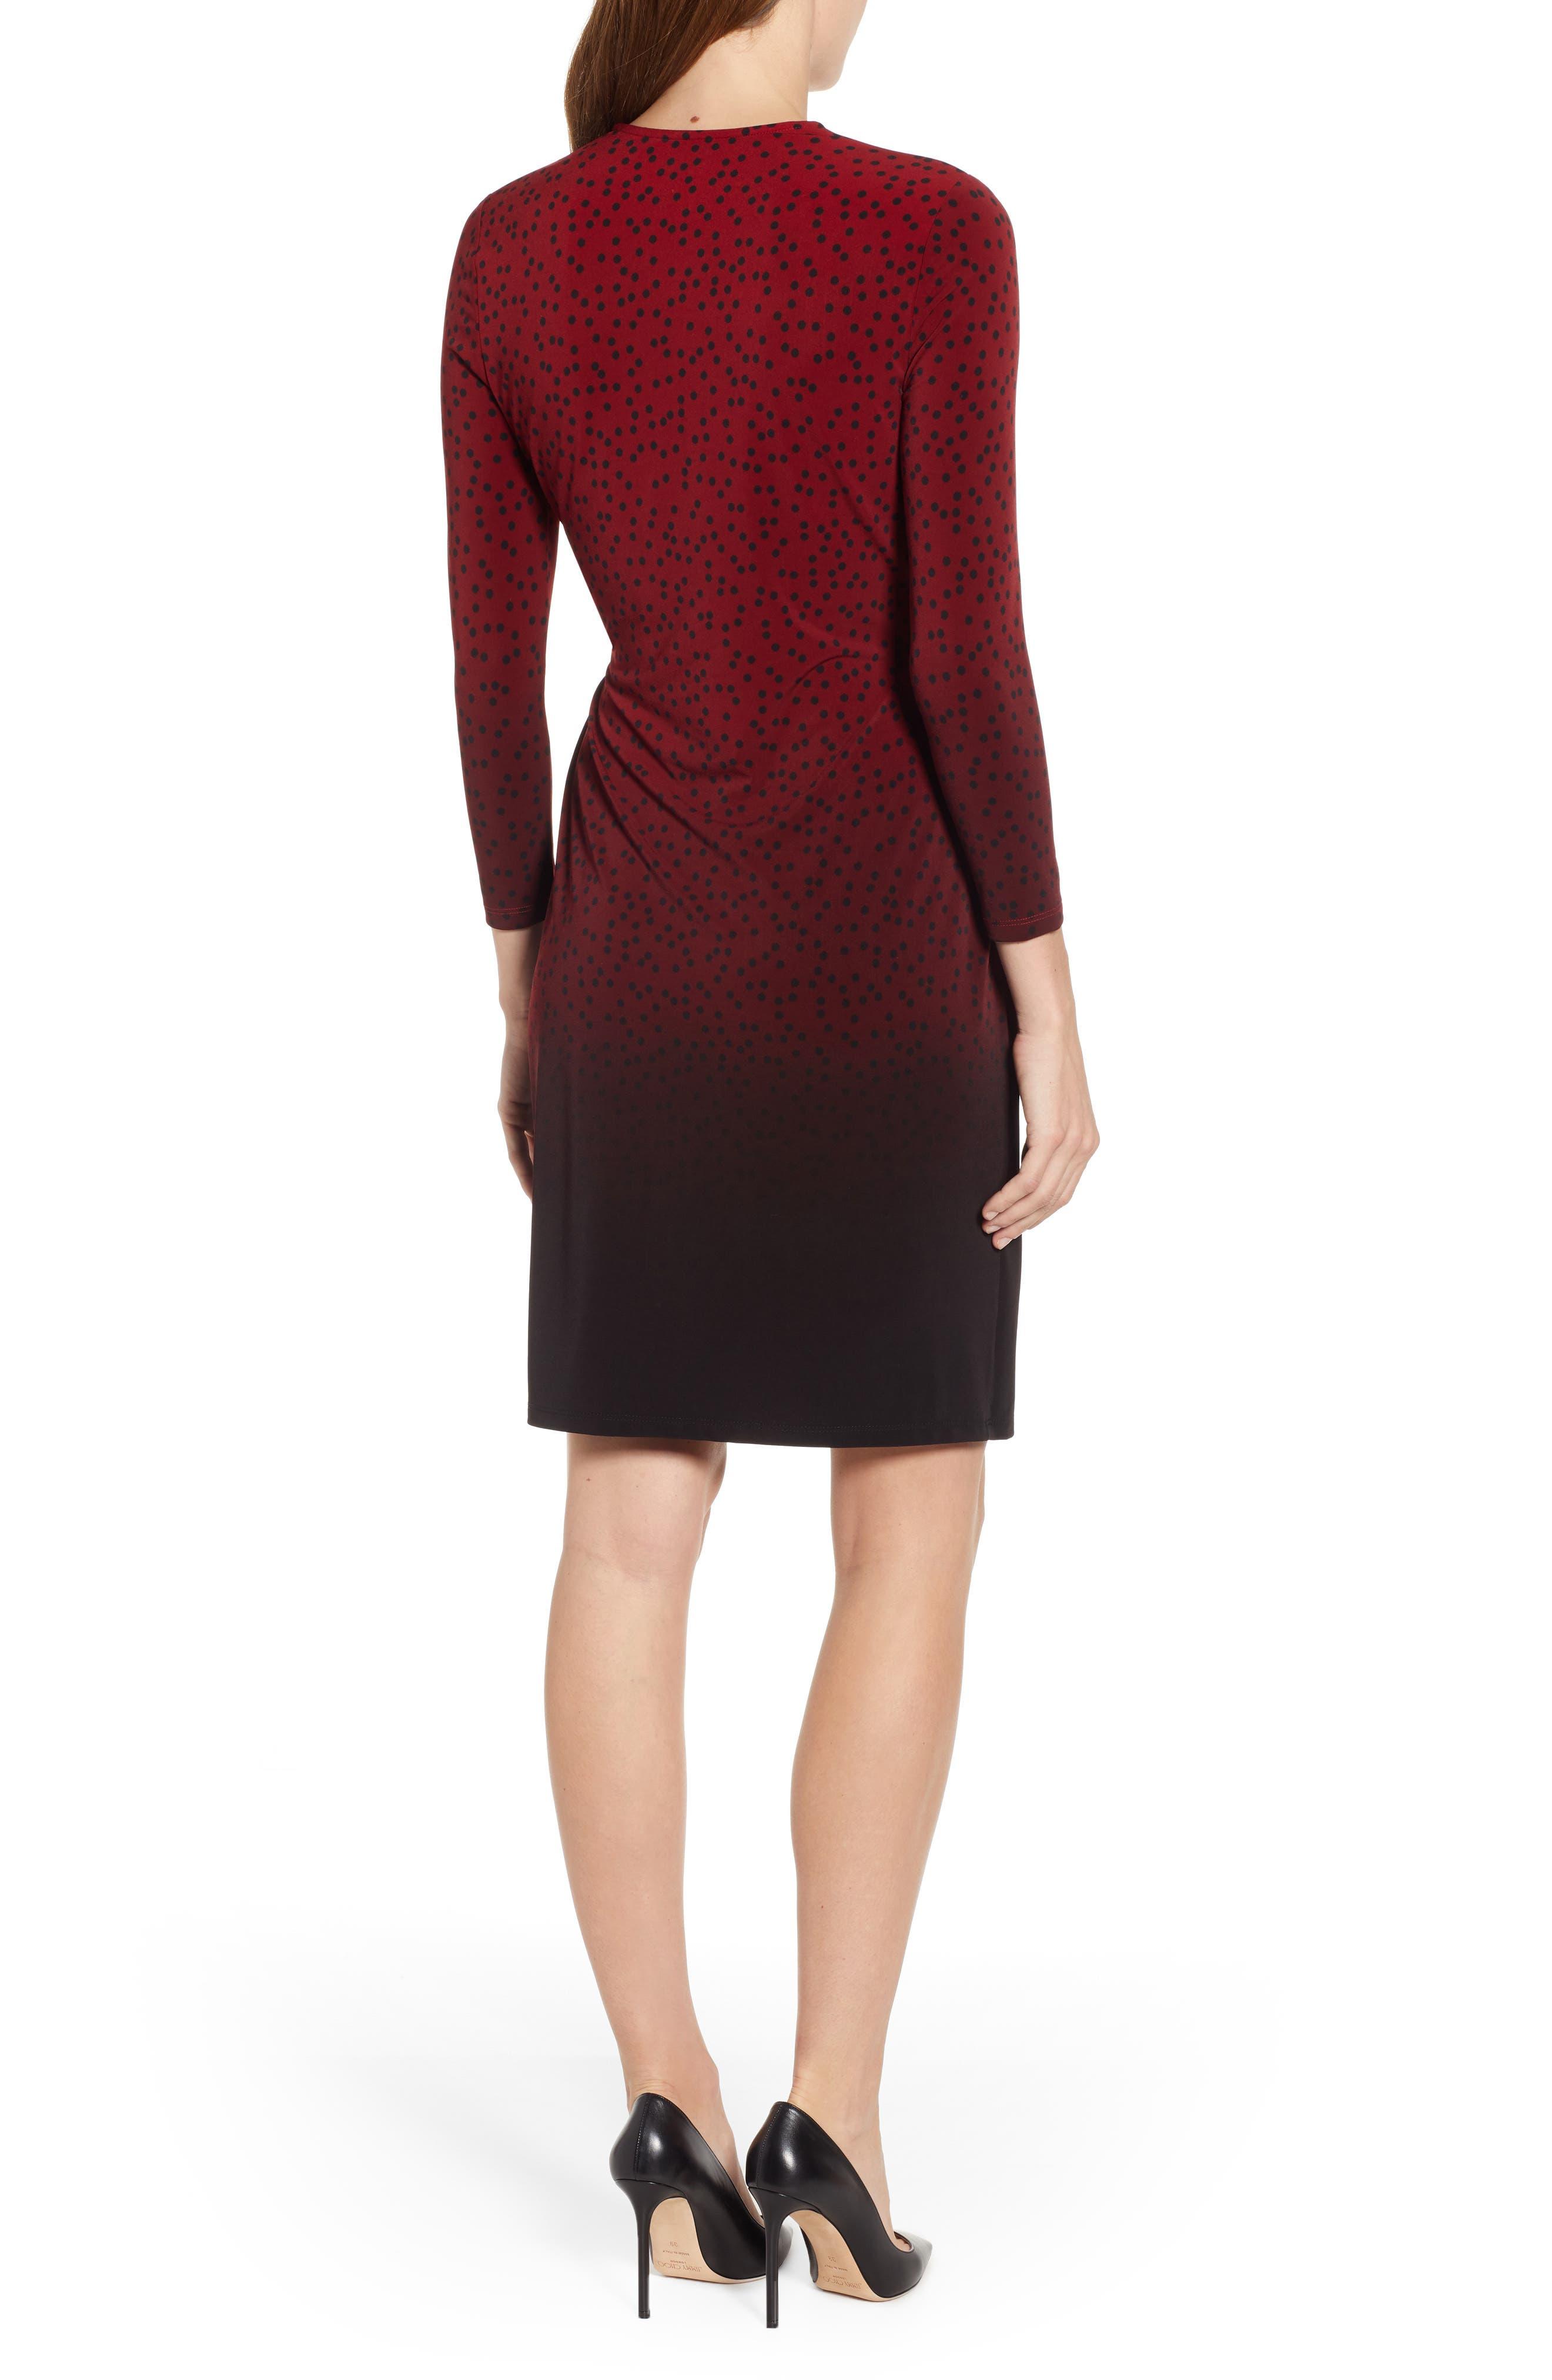 ANNE KLEIN,                             Camille Dot Faux Wrap Dress,                             Alternate thumbnail 2, color,                             DK TITIAN RED/ ANNE BLK COMBO